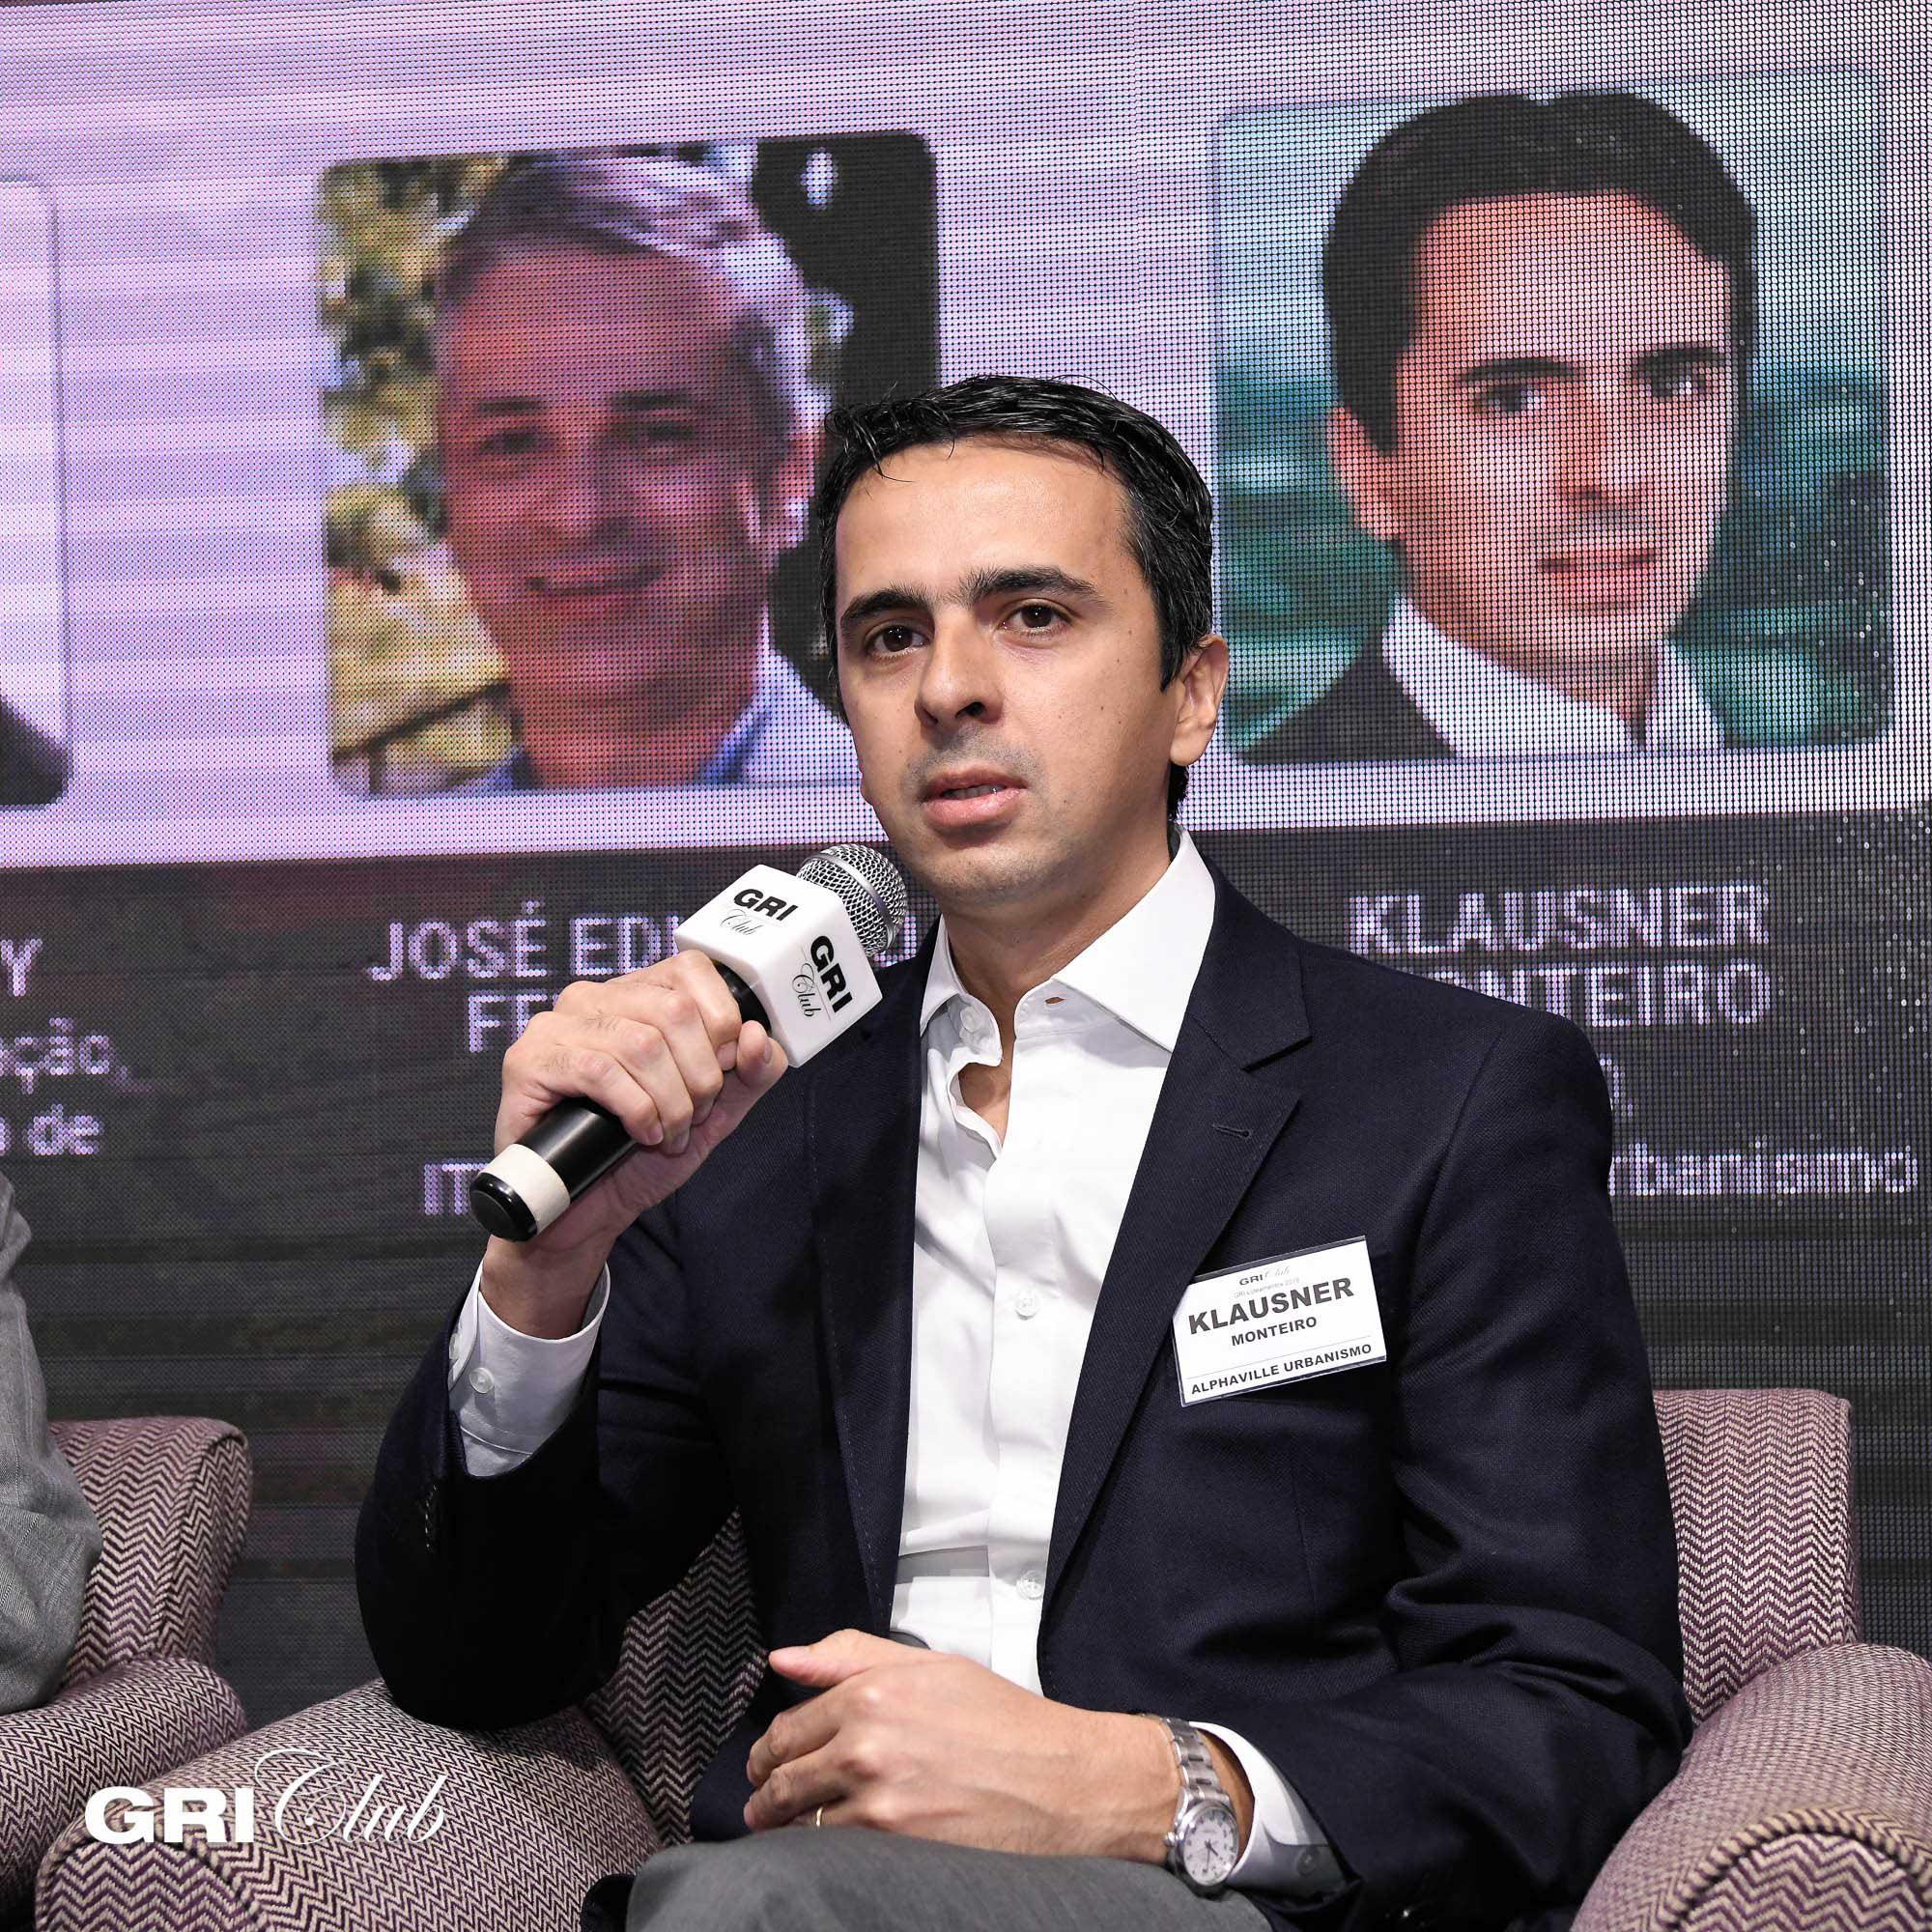 Klausner Monteiro, da Alphaville Urbanismo, durante o GRI Loteamentos 2019 | Crédito: GRI Club/Flavio Guarnieri